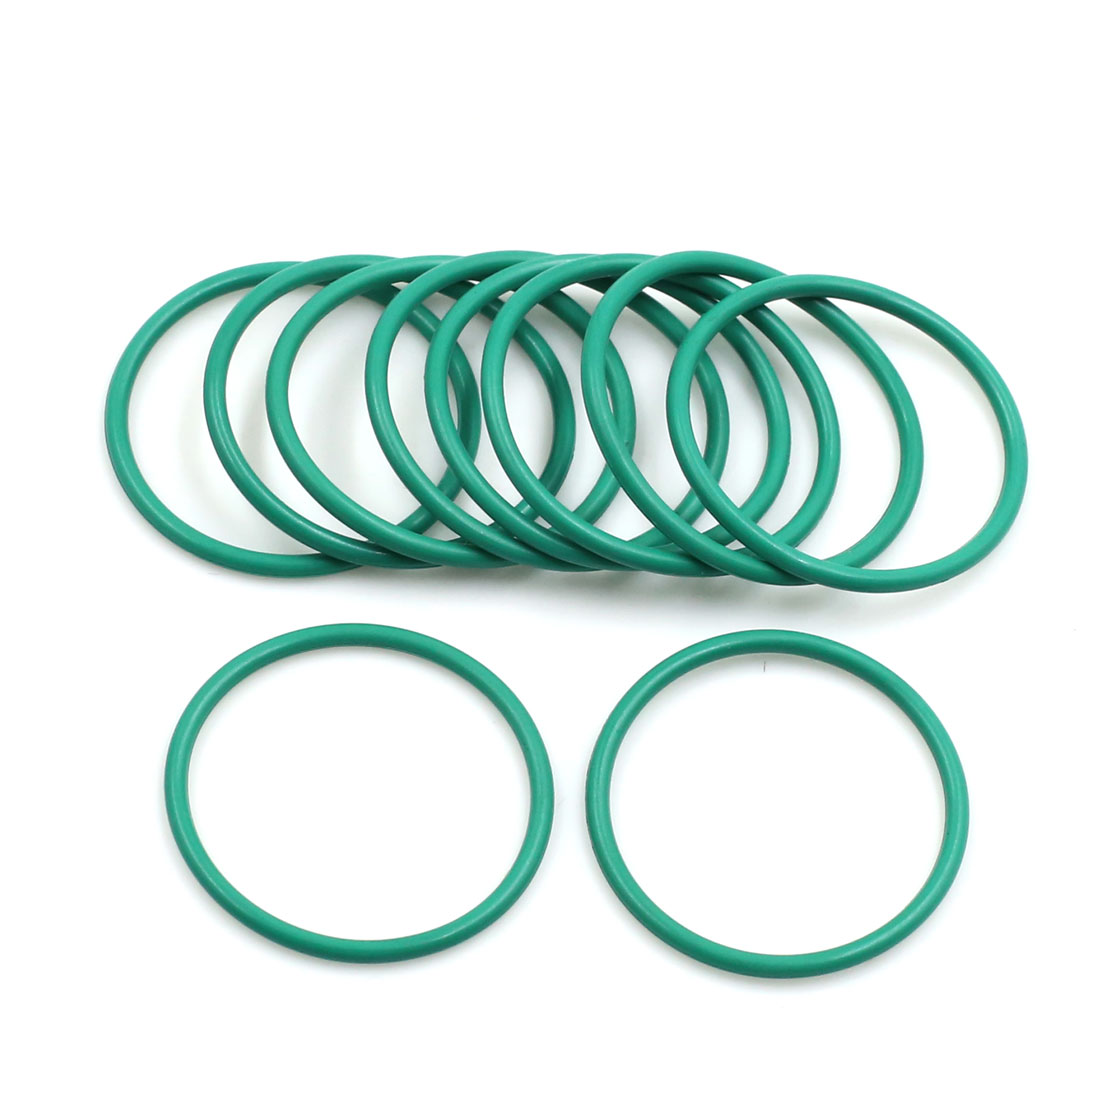 10pcs Green Universal FKM O-Ring Sealing Gasket Washer for Car 30mm x 2mm